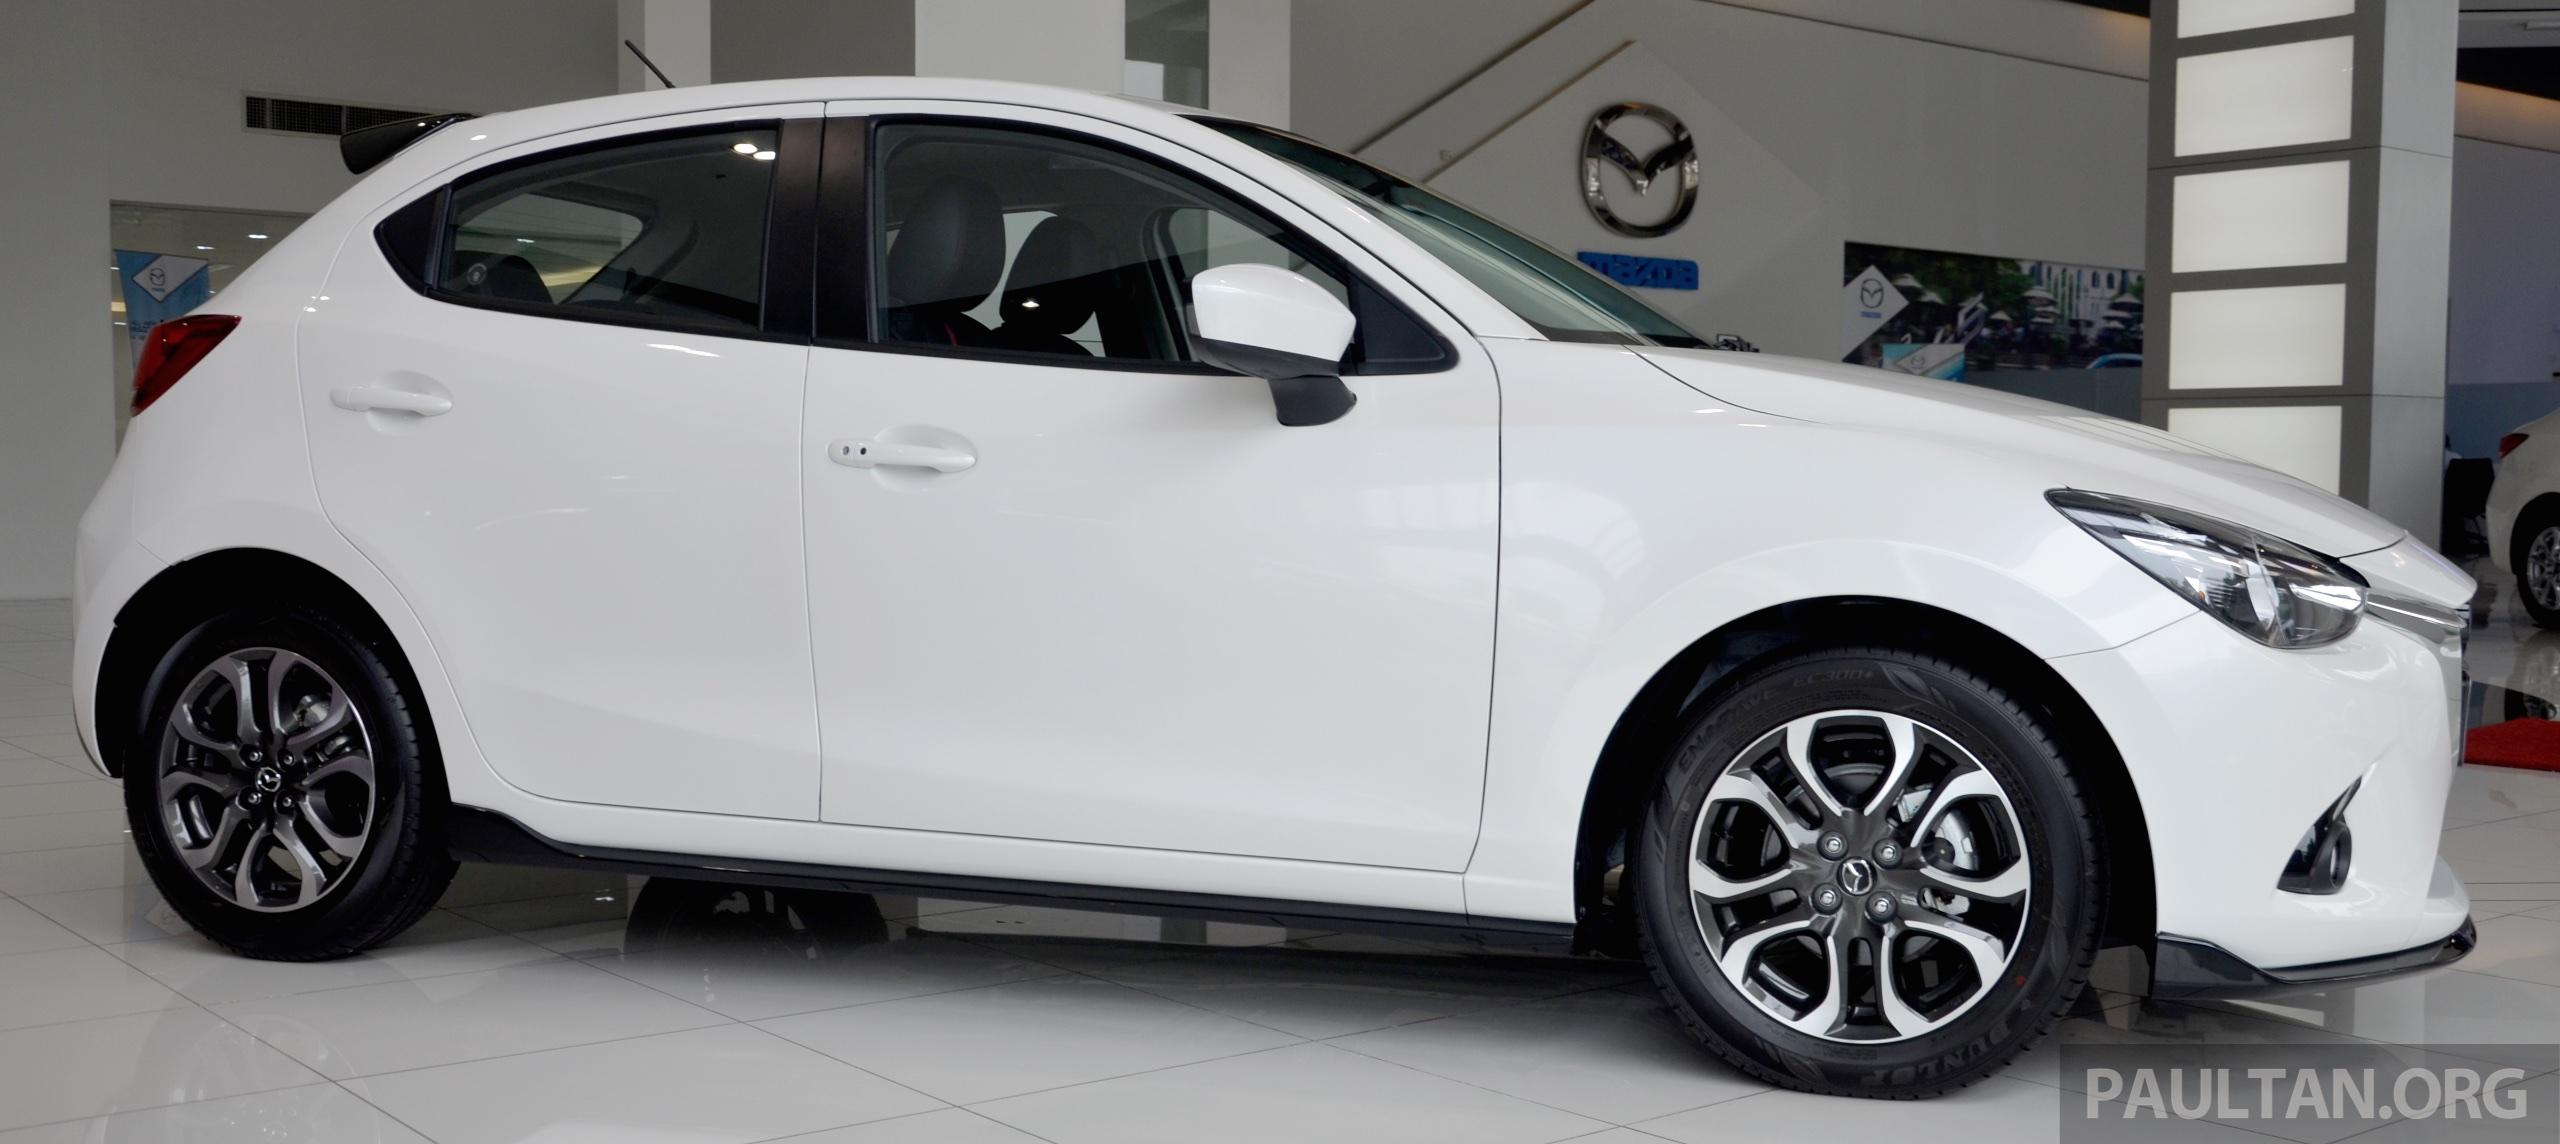 Pearl White Sports Cars